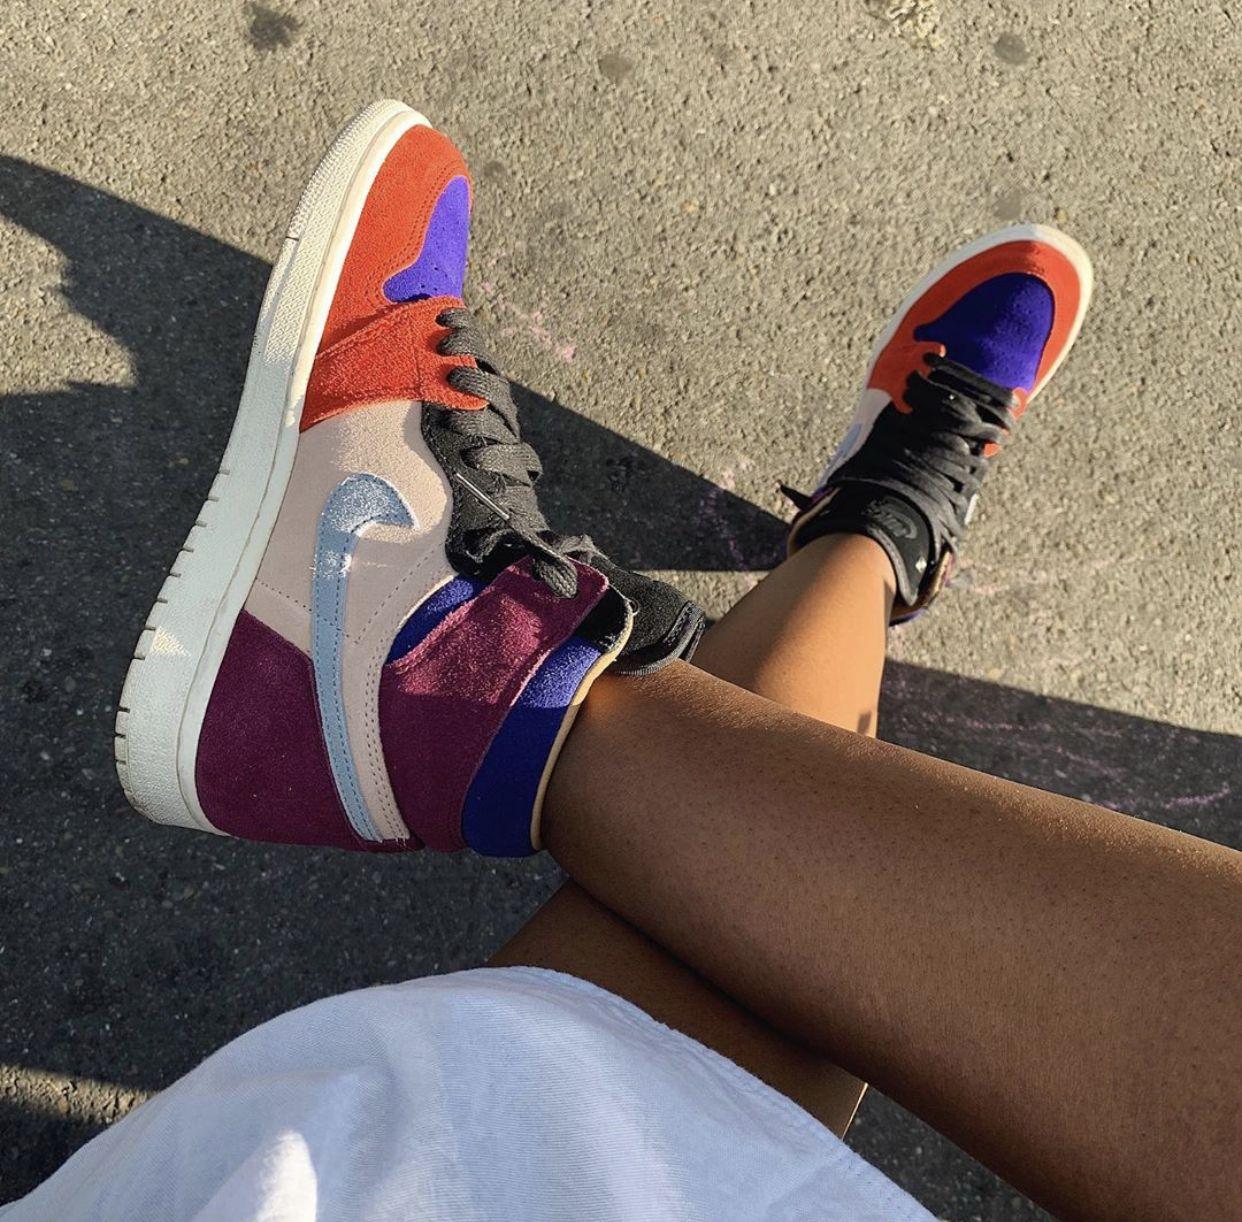 𝔭𝔦𝔫𝔱𝔢𝔯𝔢𝔰𝔱 𝔧𝔬𝔫𝔱𝔞 𝔪𝔦𝔫𝔞𝔧 Beach model, Fresh shoes, Retro